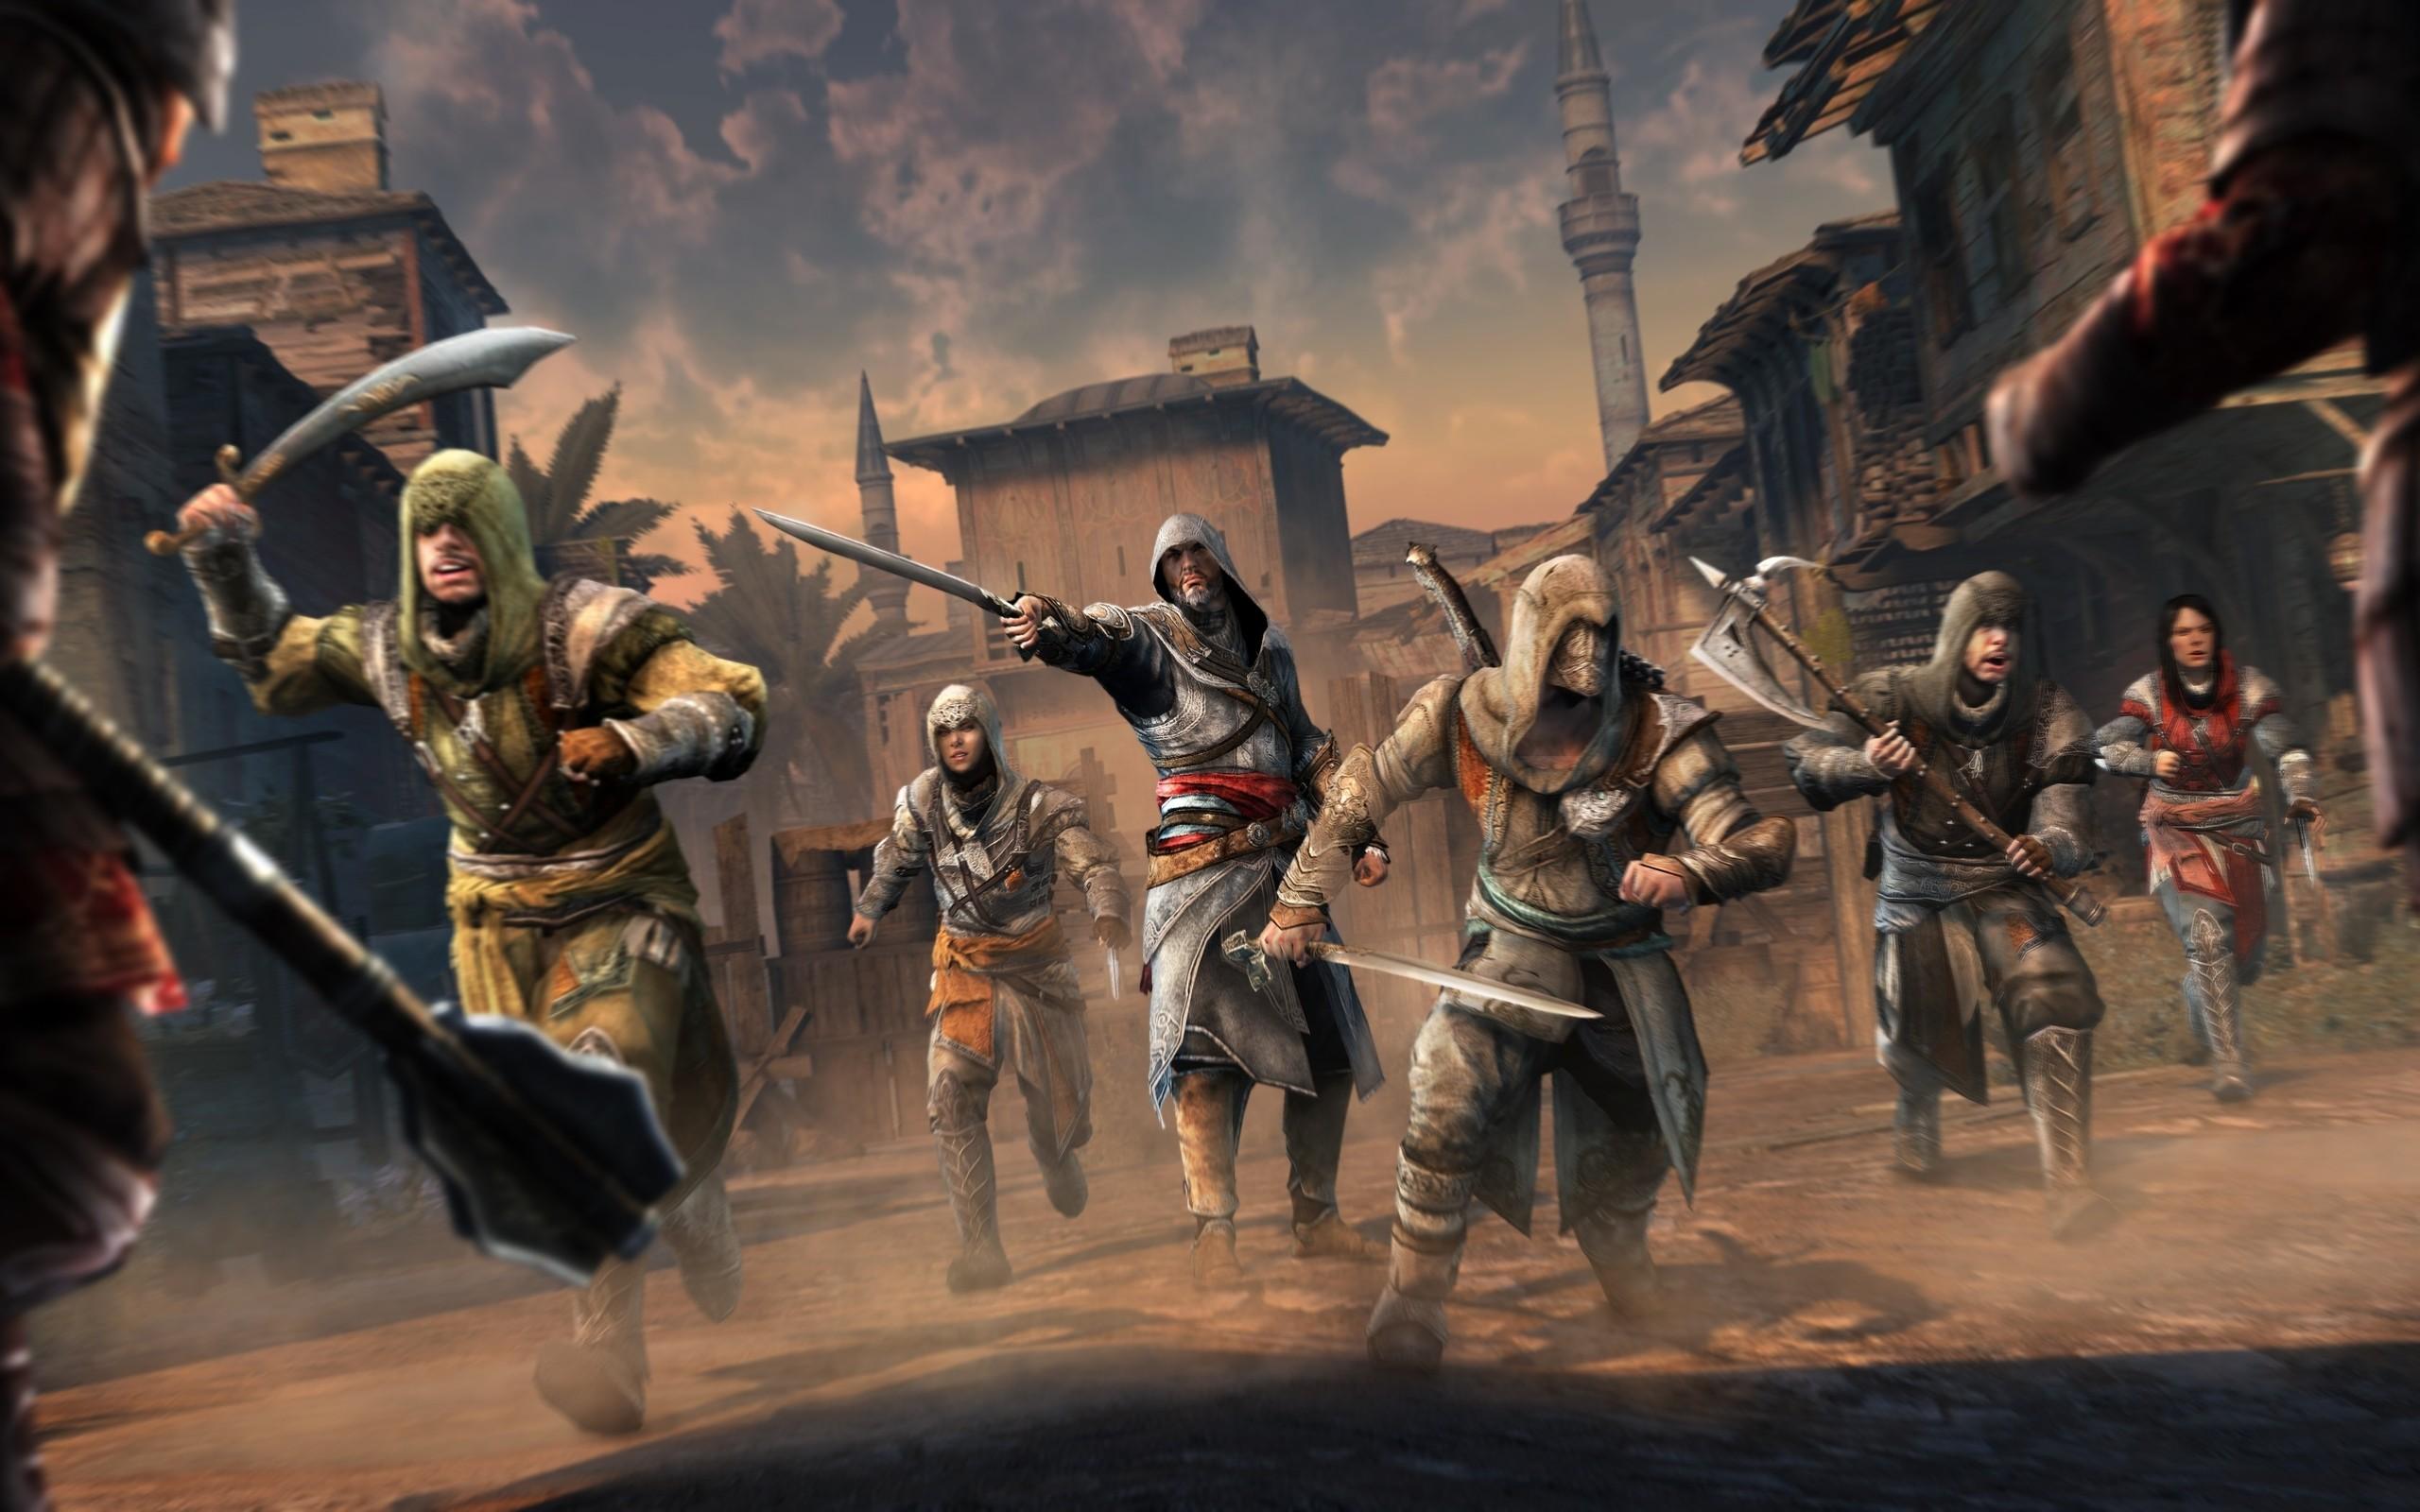 Assassins Creed Wallpaper Hd 1080p Assassins Creed All Assassins Wallpaper 88 Images